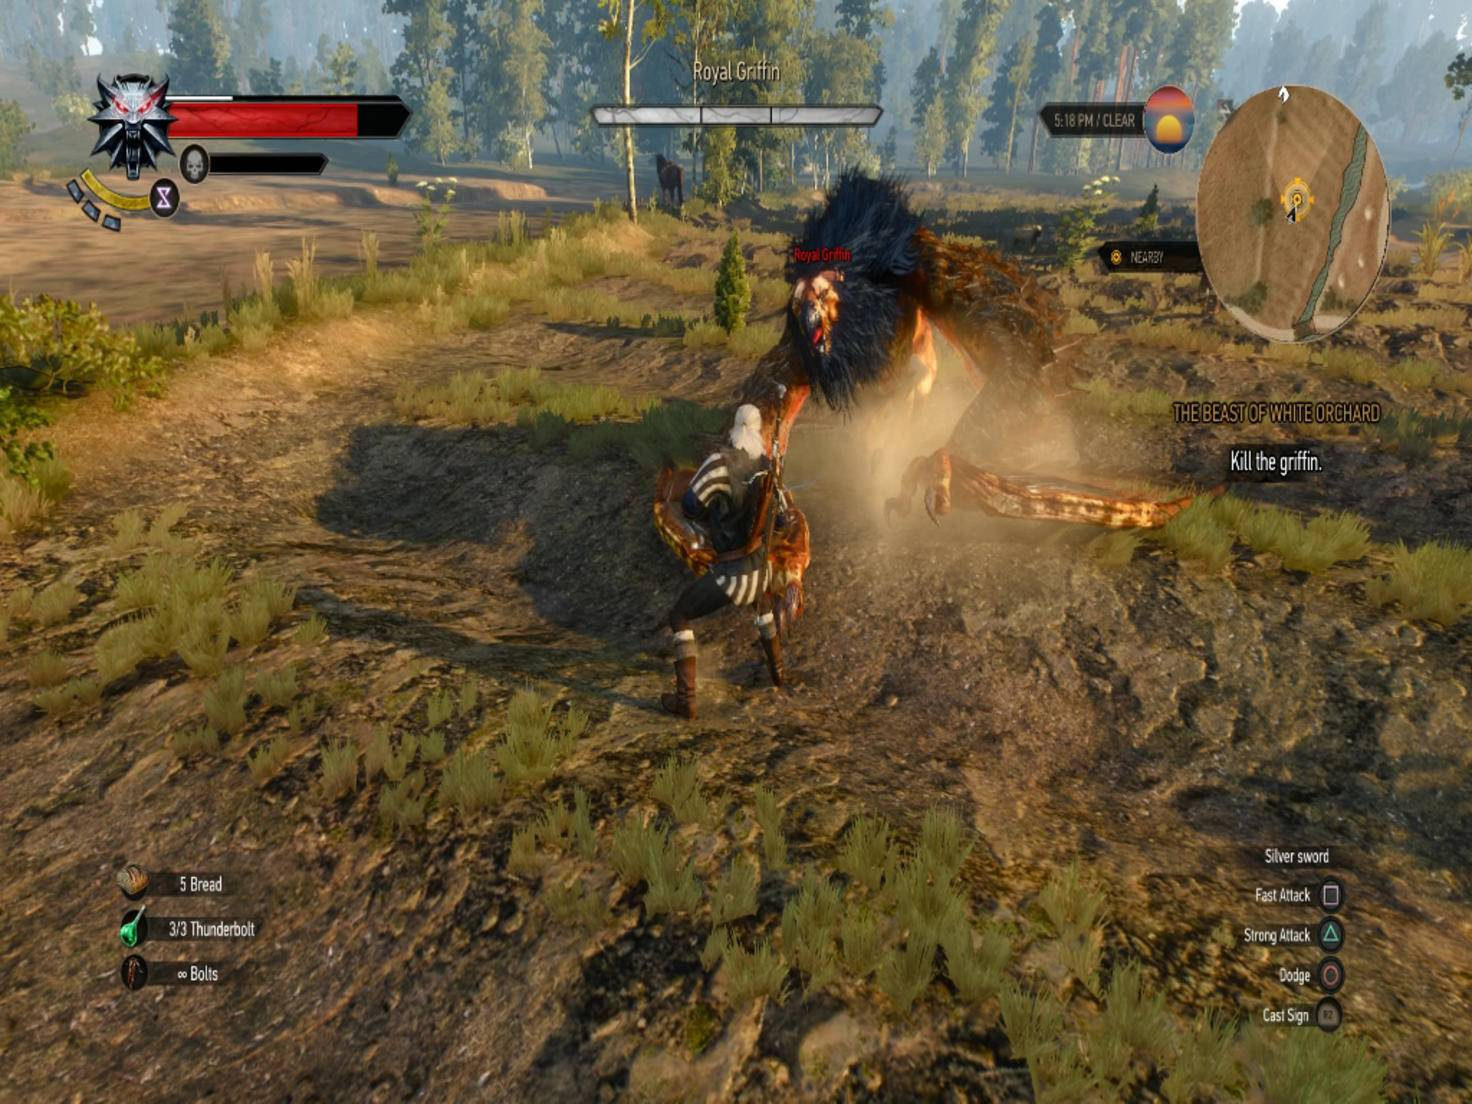 Der Kampf gegen den Greif gehört zu den ersten Highlights des Spiels.